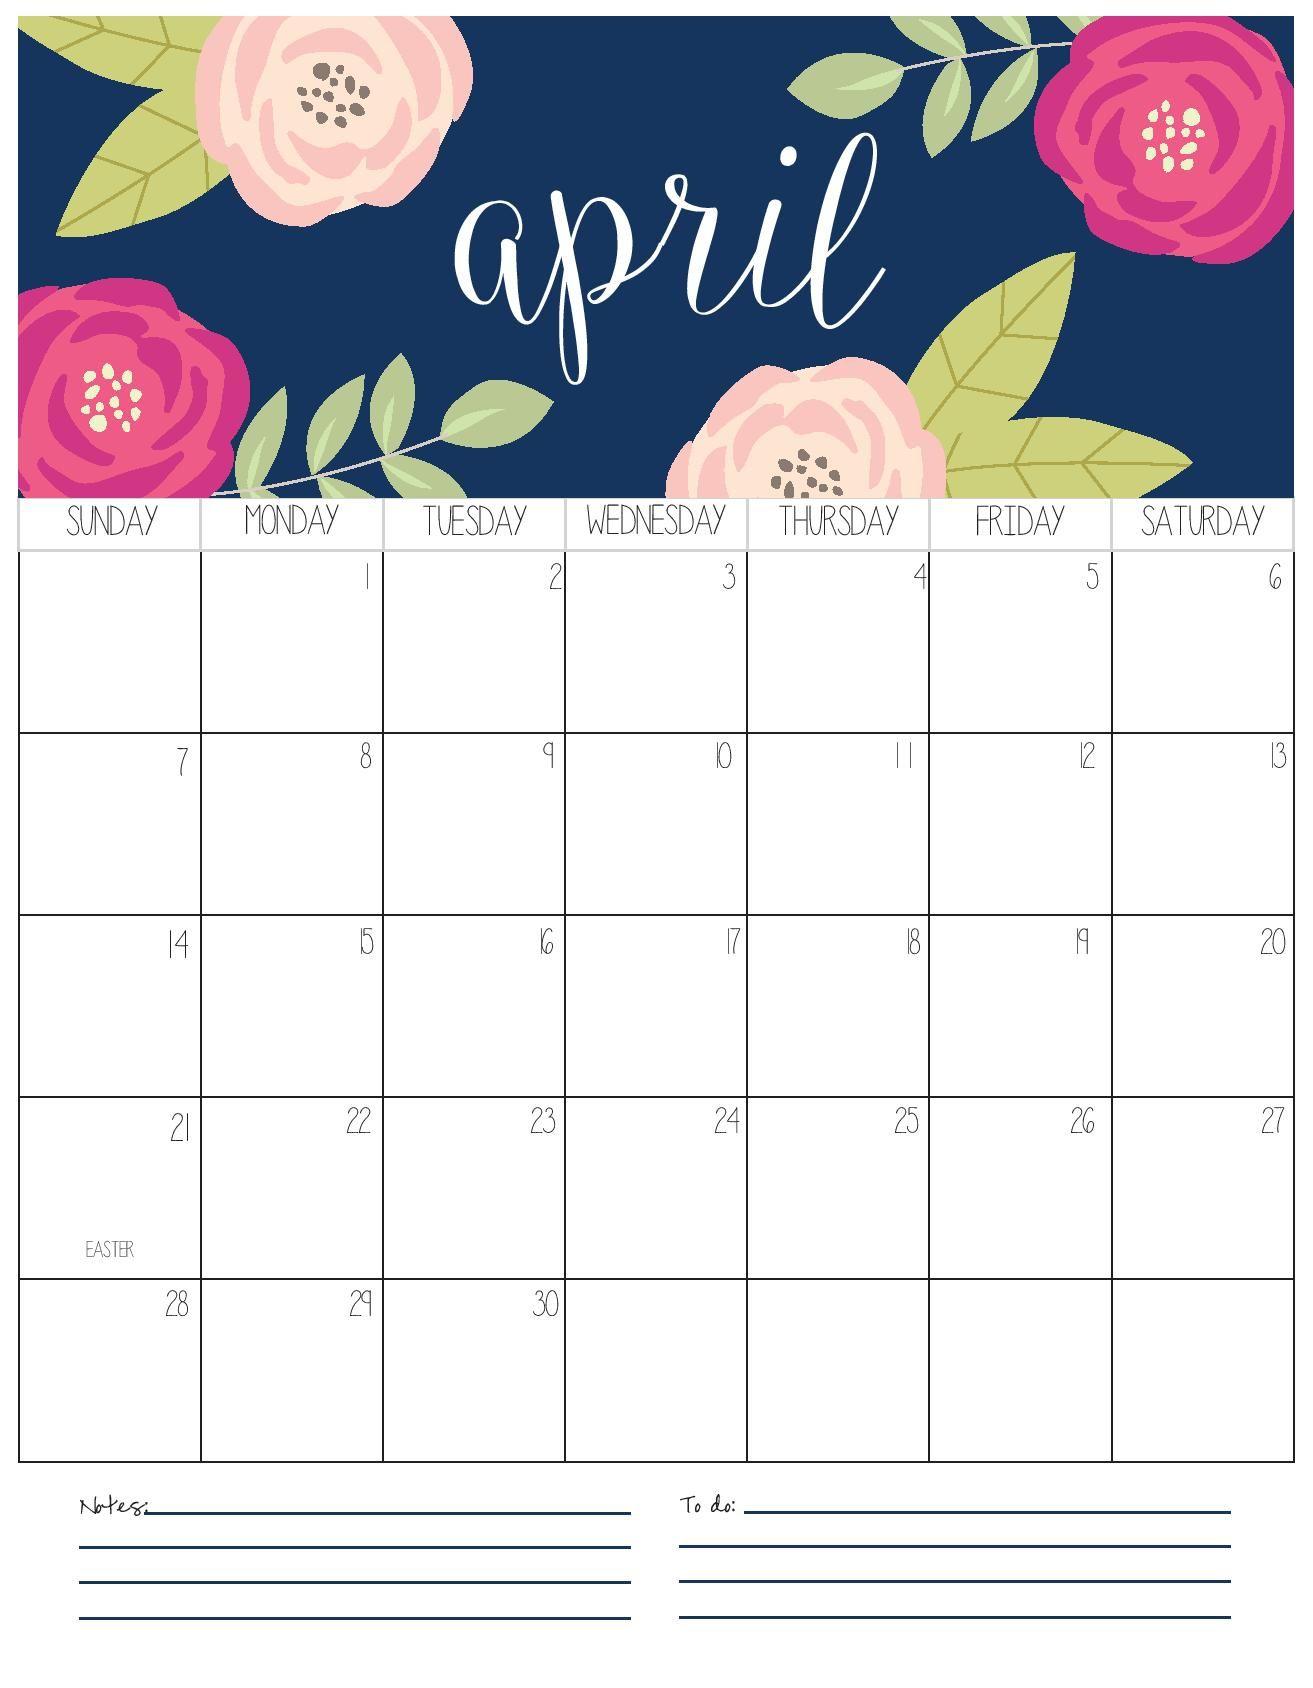 kalender 2019 zum ausdrucken f r kinder pencetakan desain dan gambar. Black Bedroom Furniture Sets. Home Design Ideas